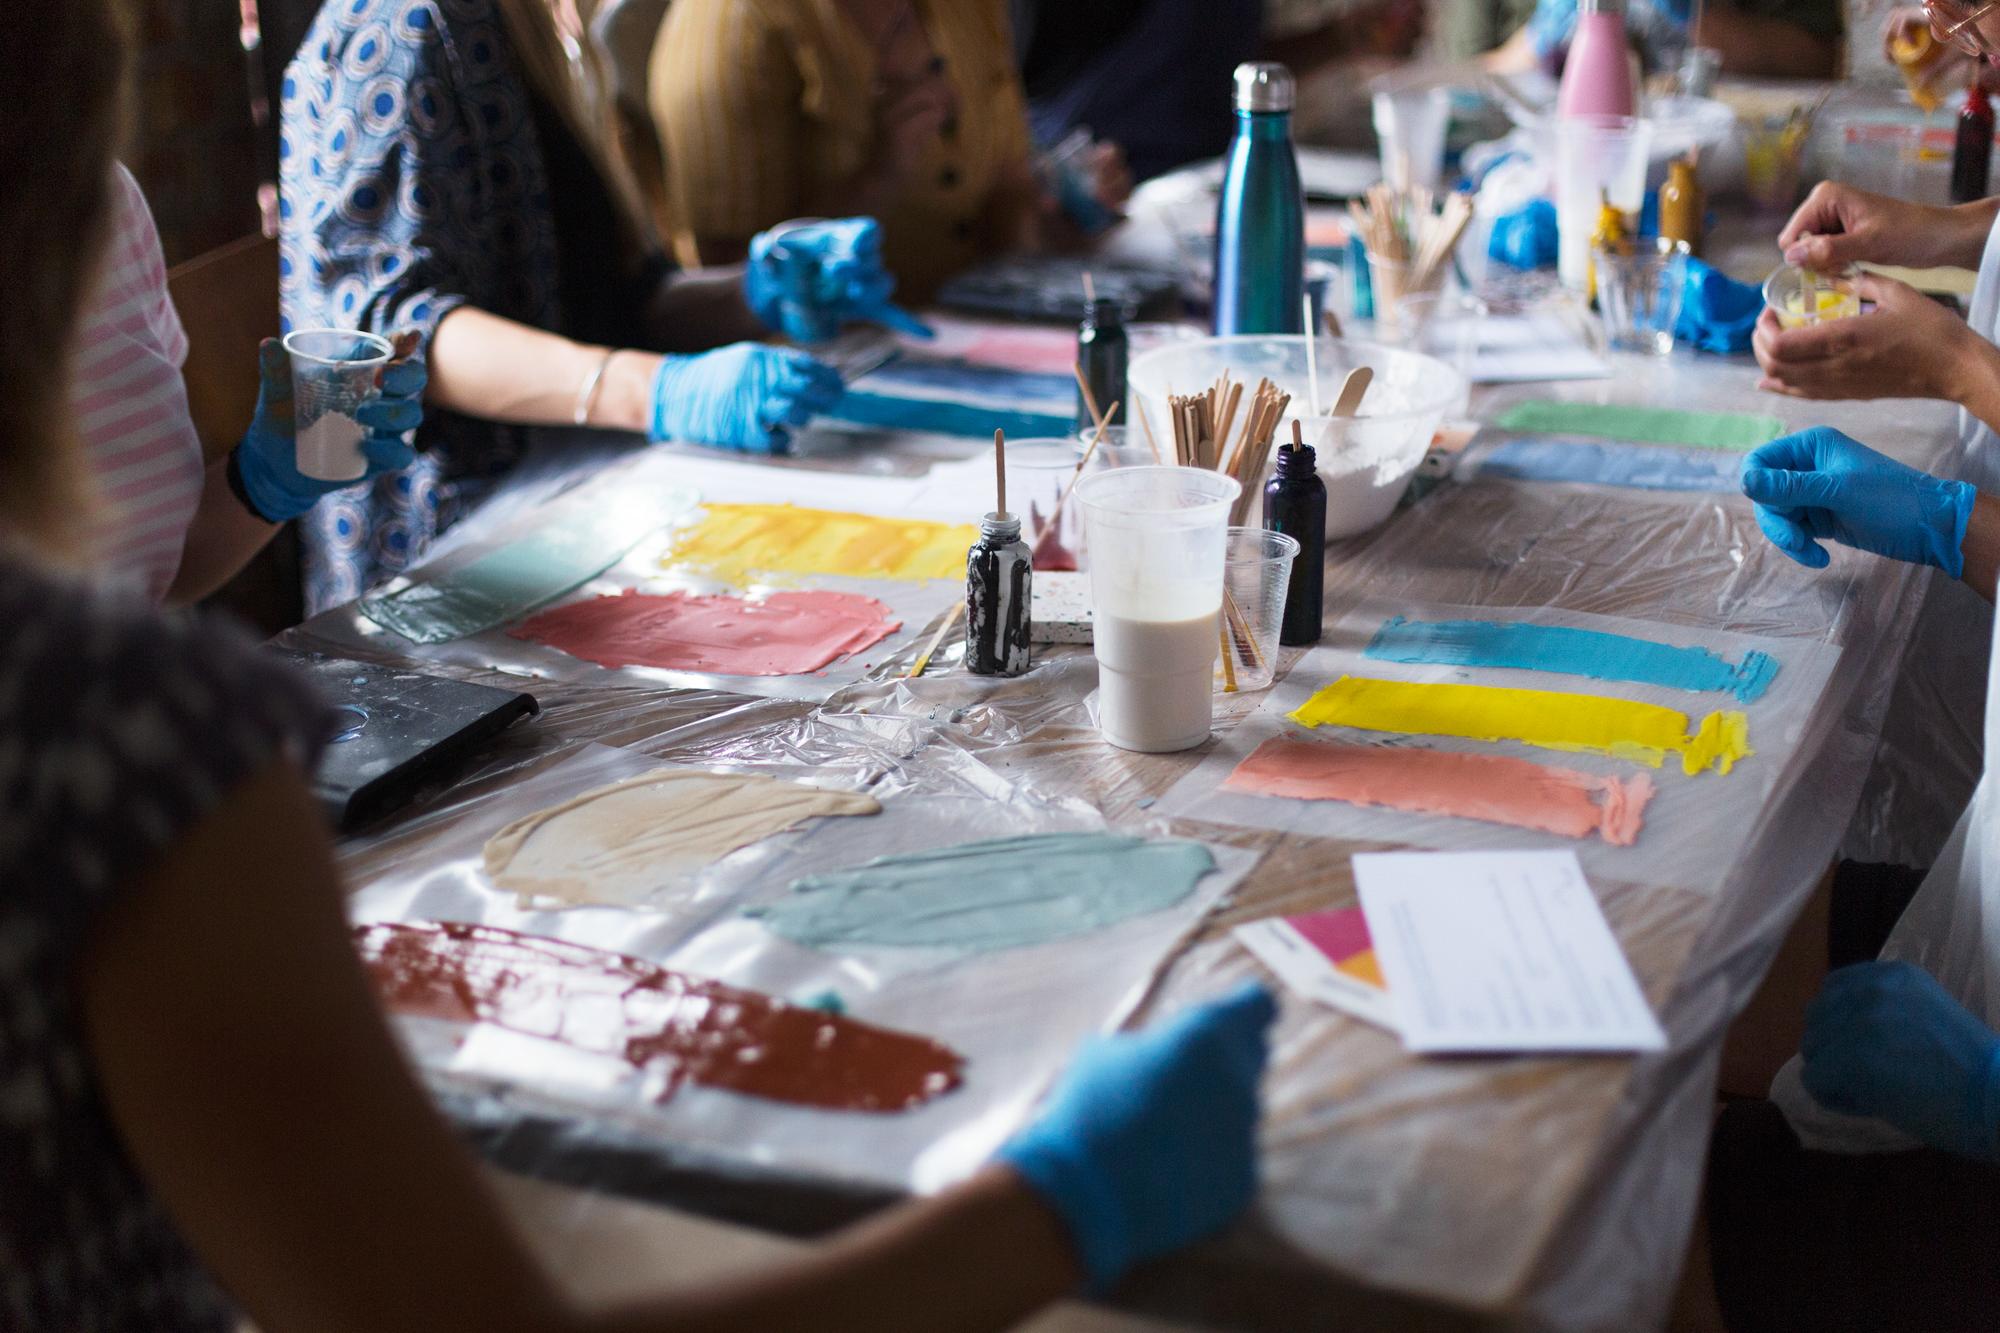 Modern art and craft classes in Bristol workshop. Attendees making Jesmonite Terrazzo tiles at workshop with Katie Gilles